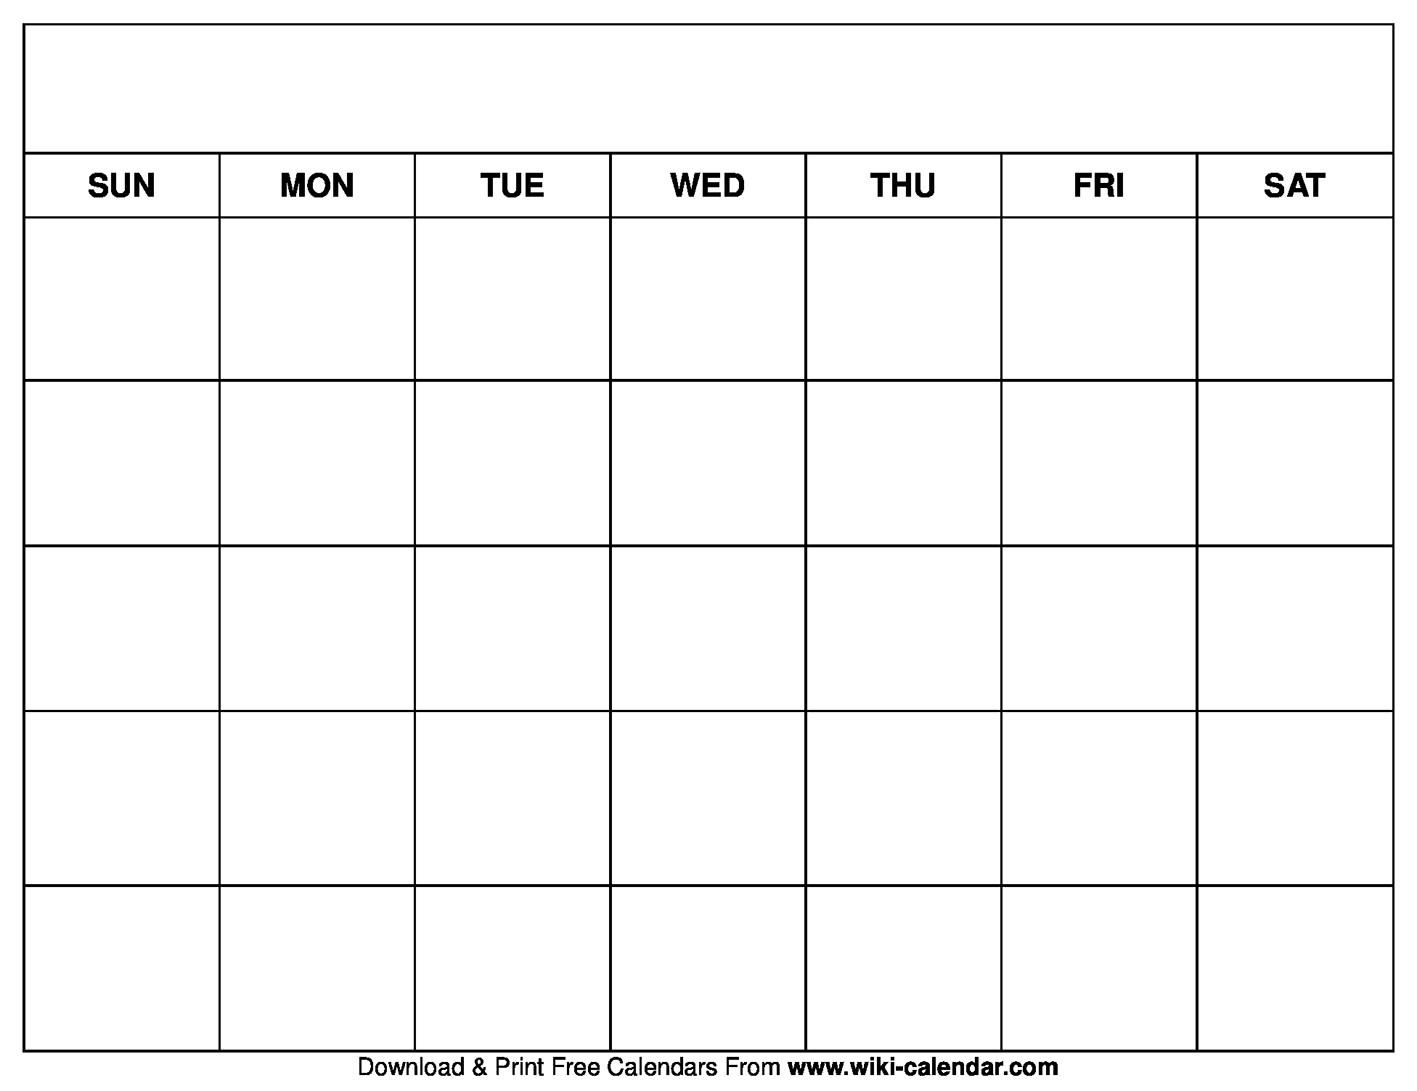 Download And Print Calendars For 2020 - Wiki Calendar  Calendar Print Off